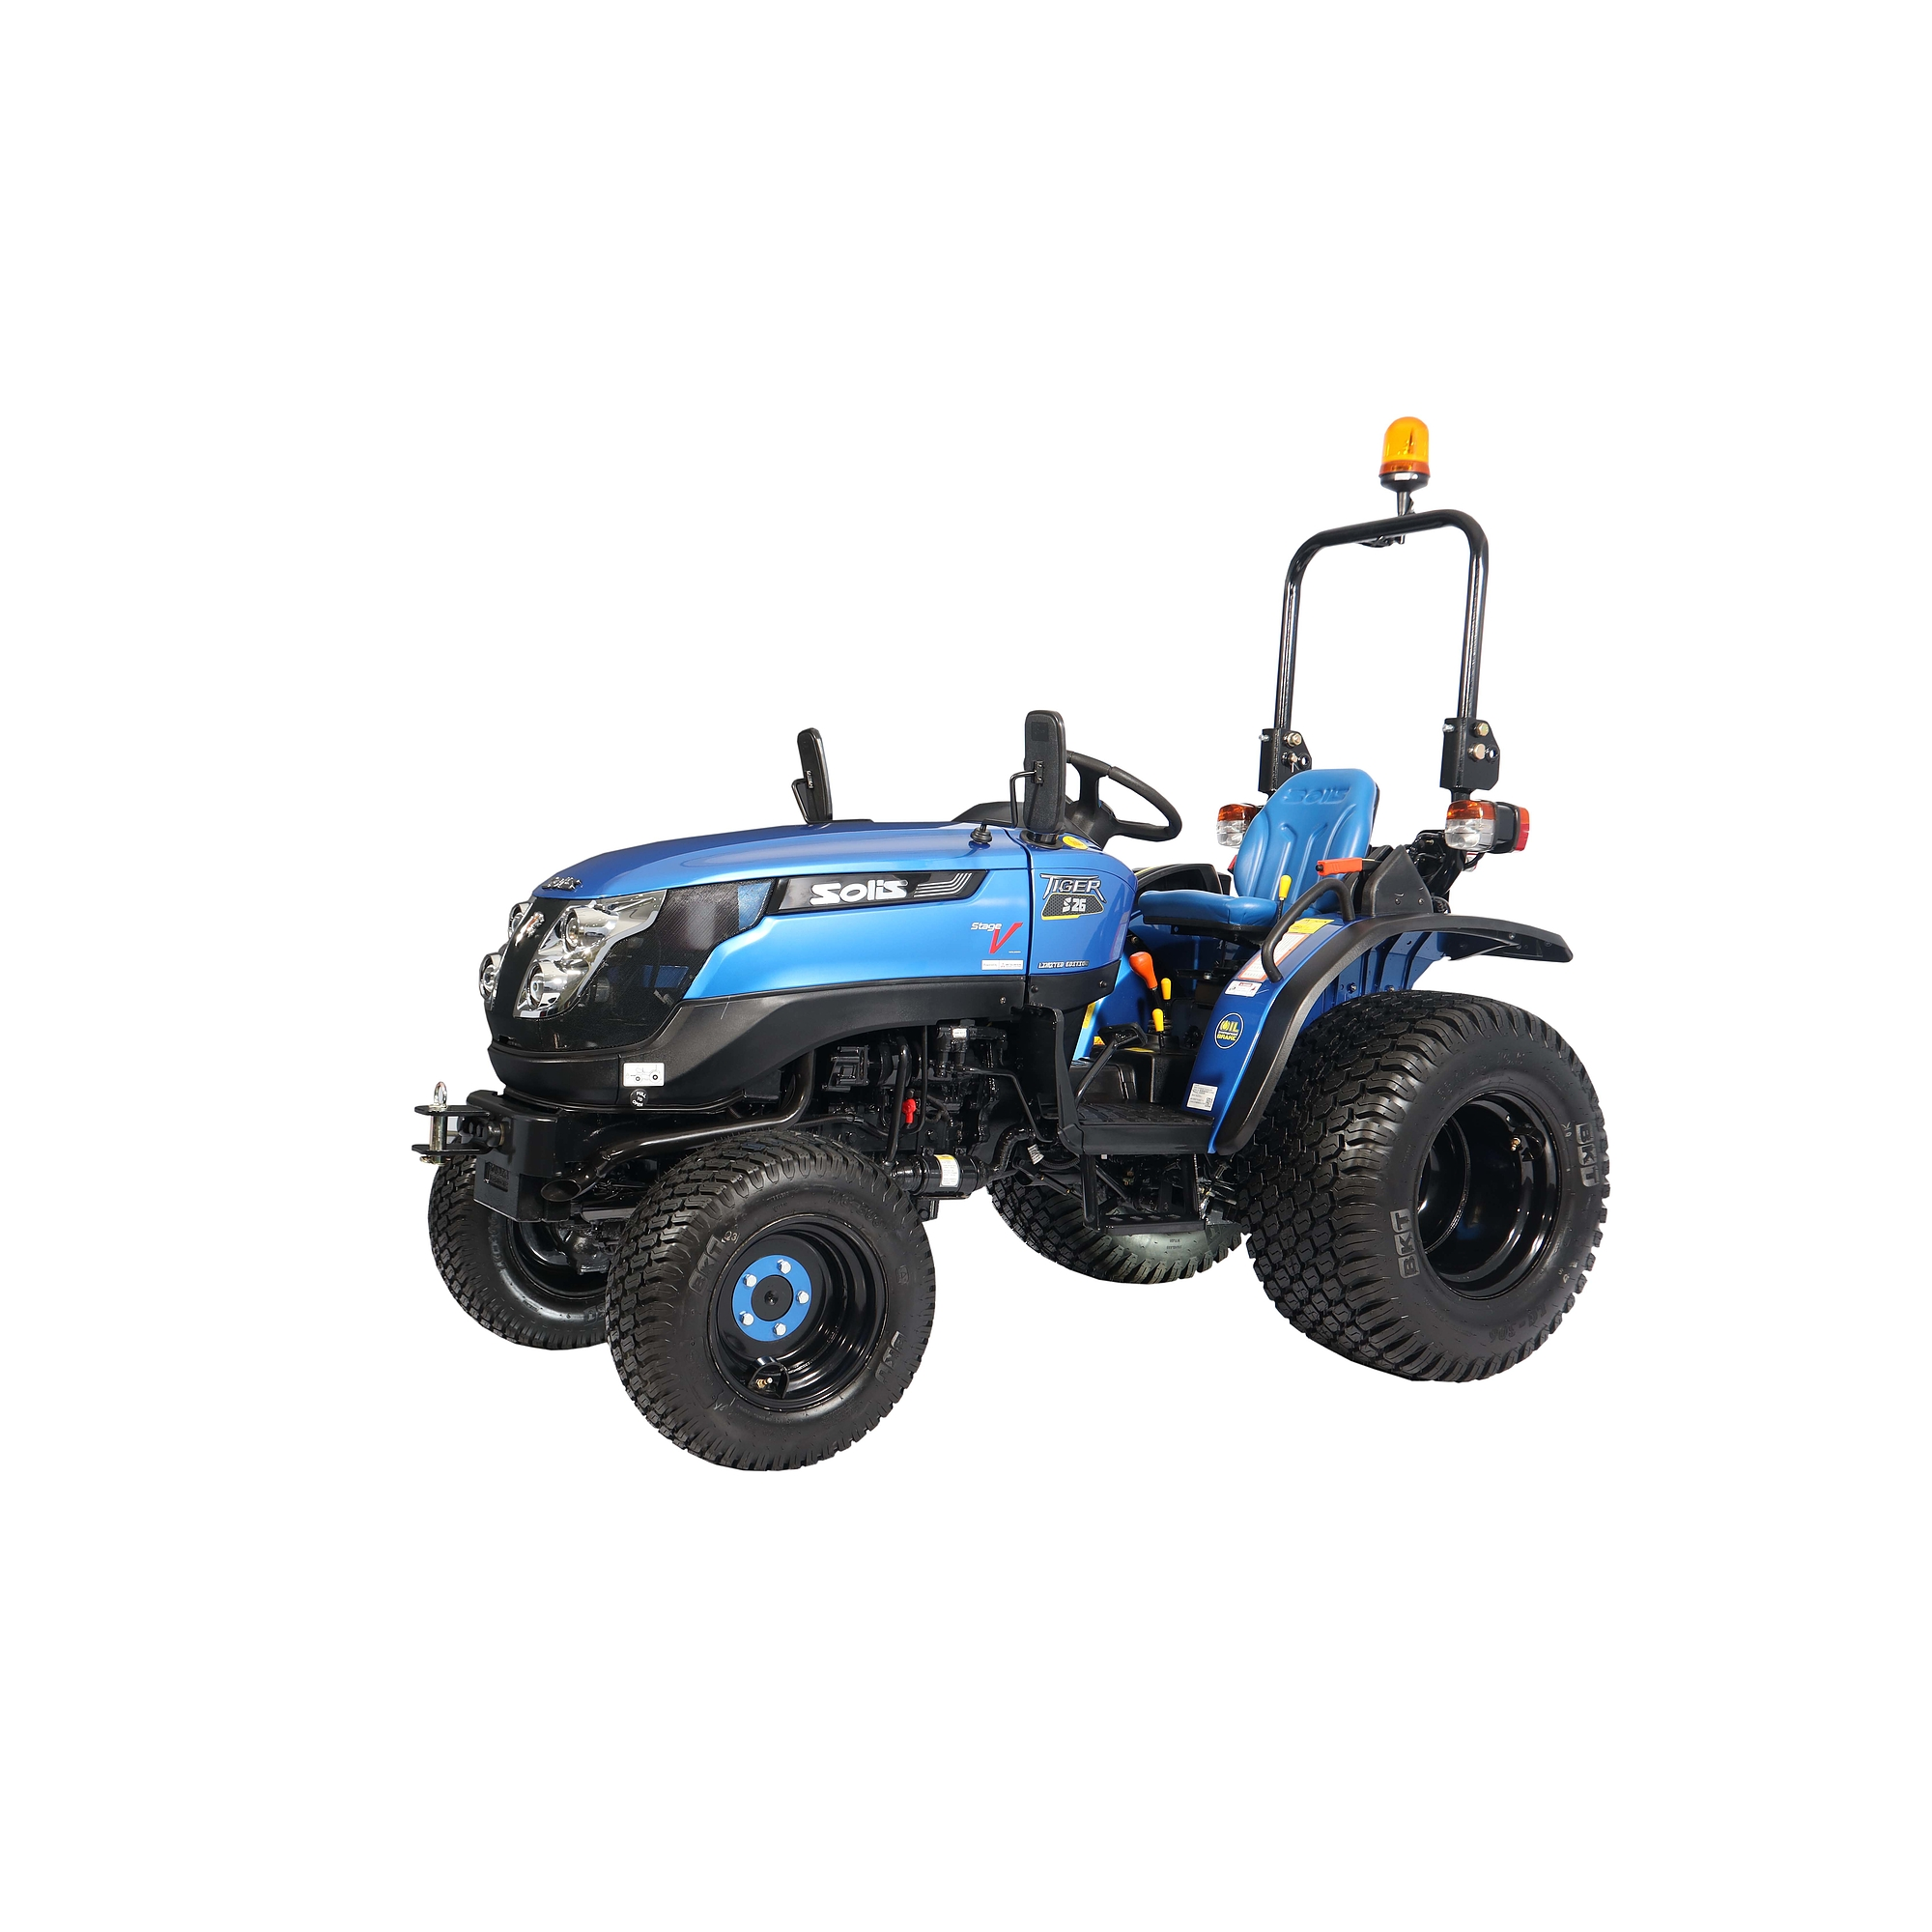 solis-26-limited-edition-traktor-2